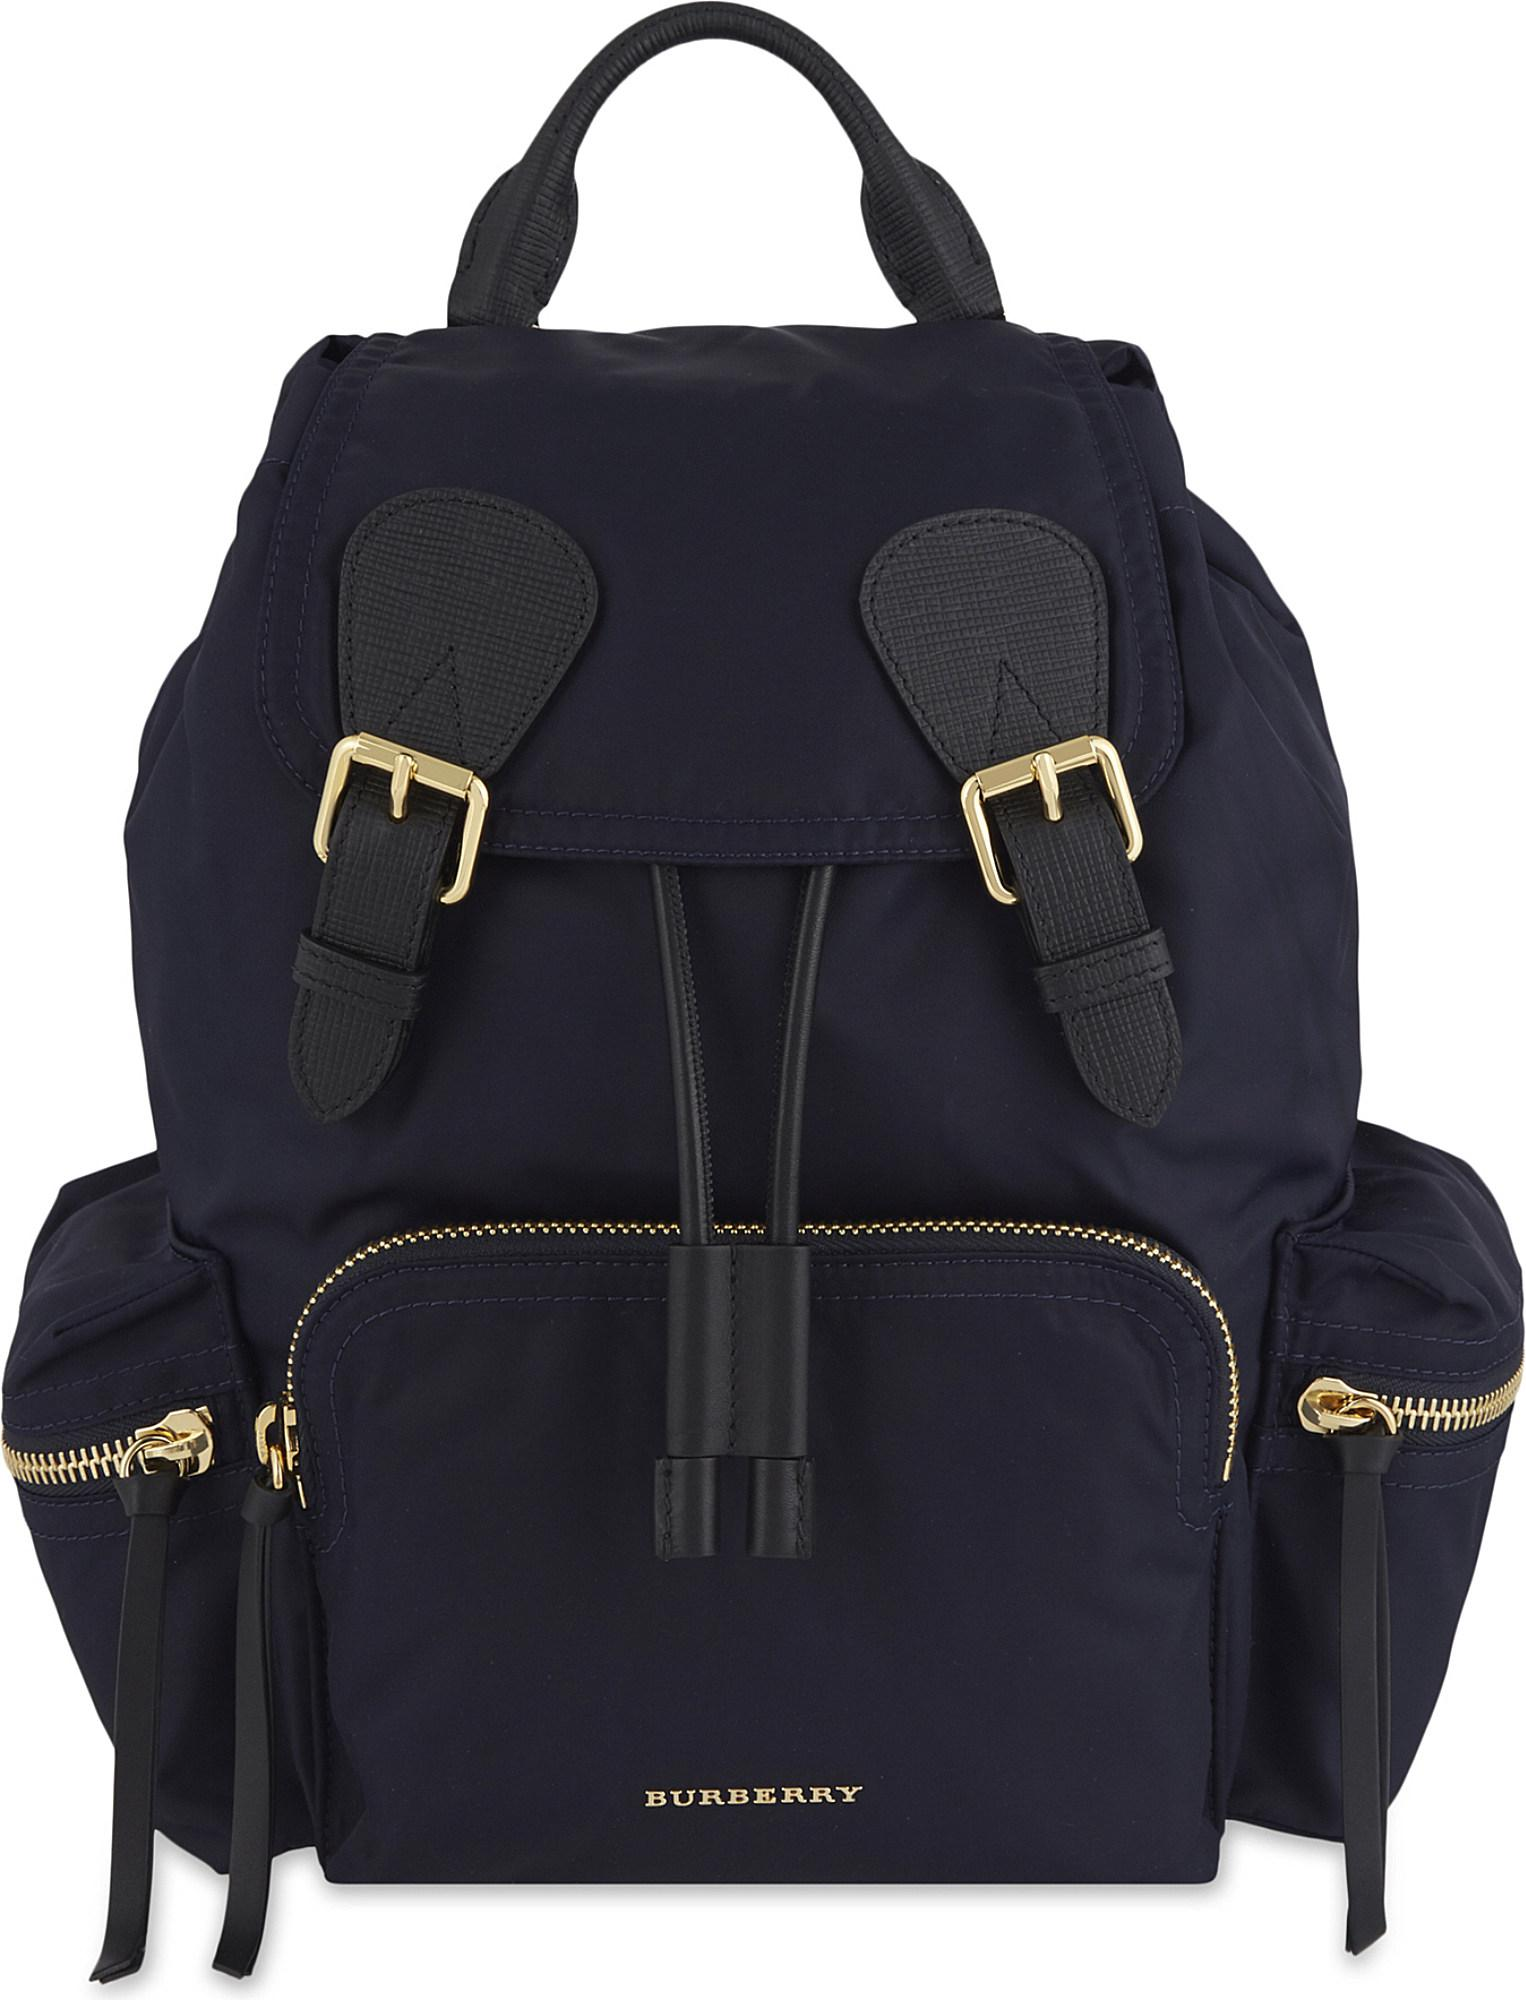 Burberry - Blue Medium Nylon Backpack - Lyst. View fullscreen 26a13057646a5